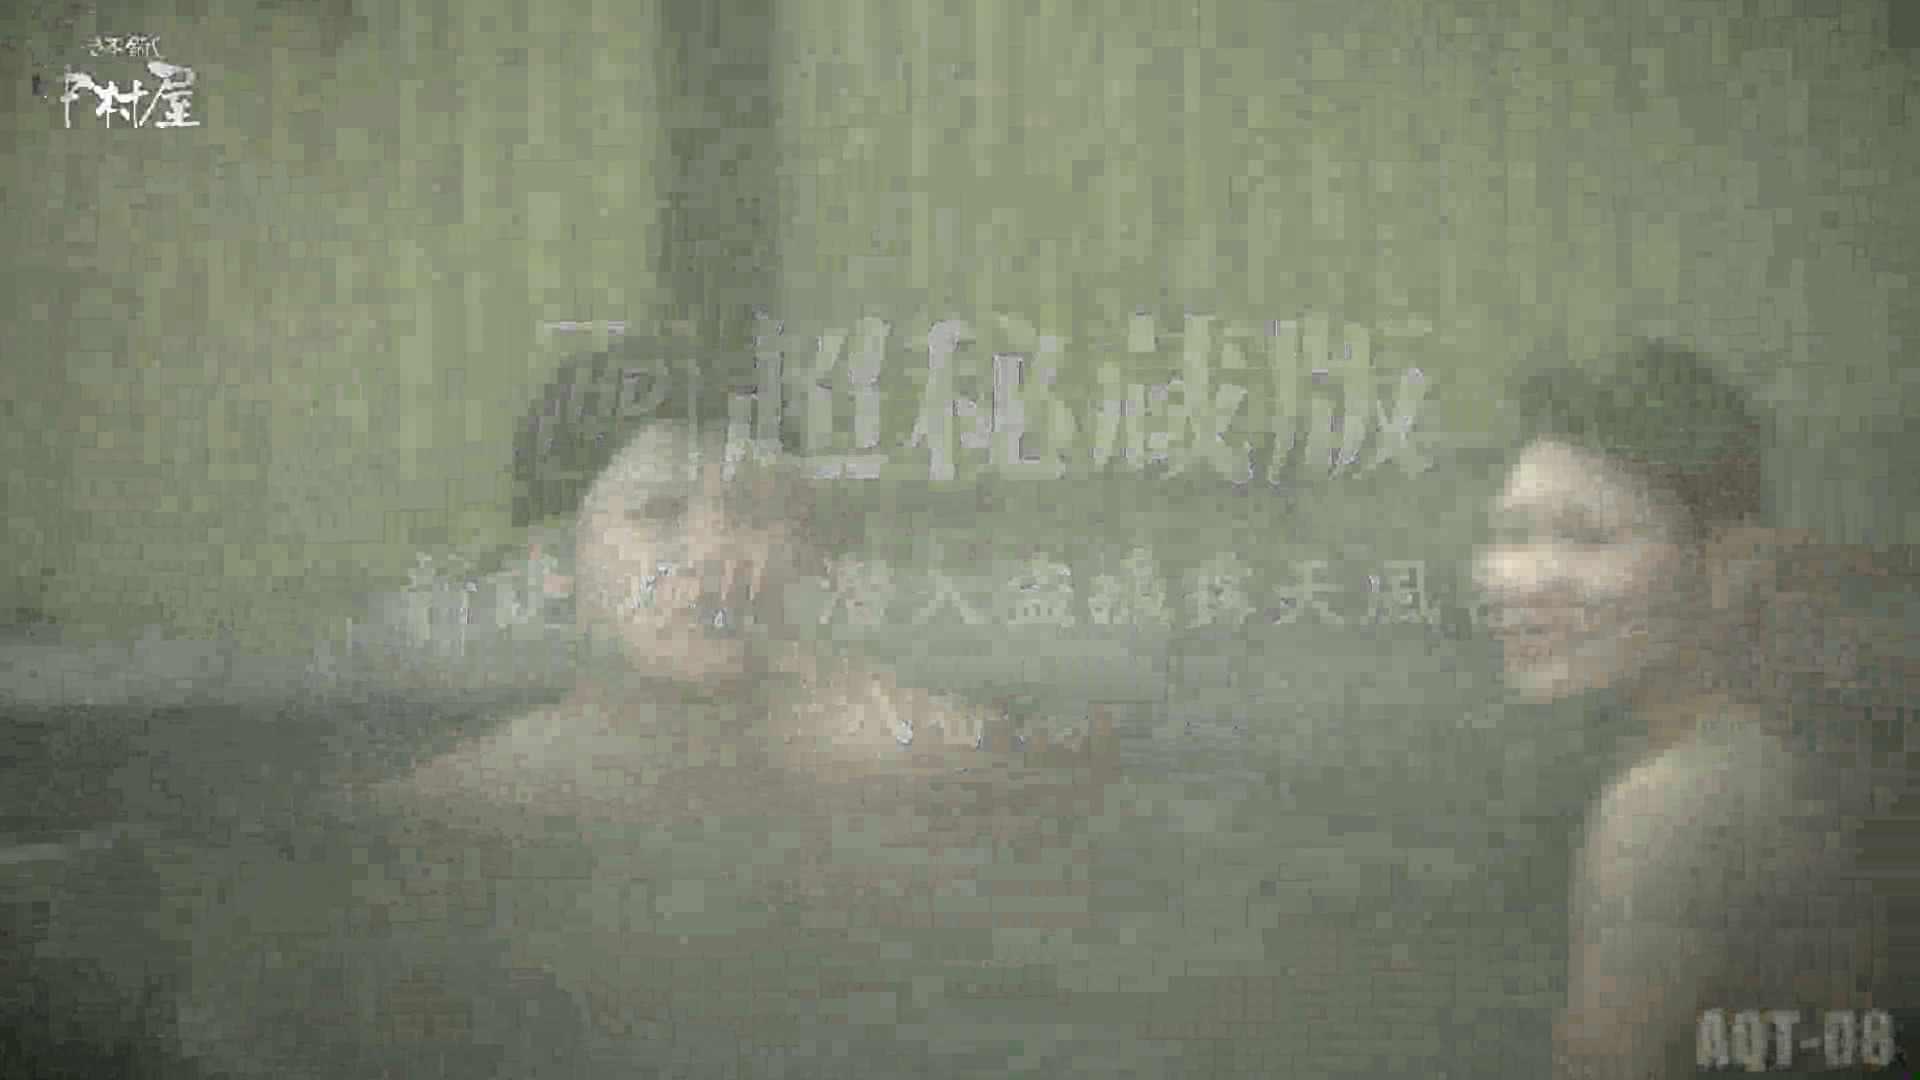 Aquaな露天風呂Vol.872潜入盗撮露天風呂八判湯 其の五 潜入突撃 | 盗撮師作品  85pic 1